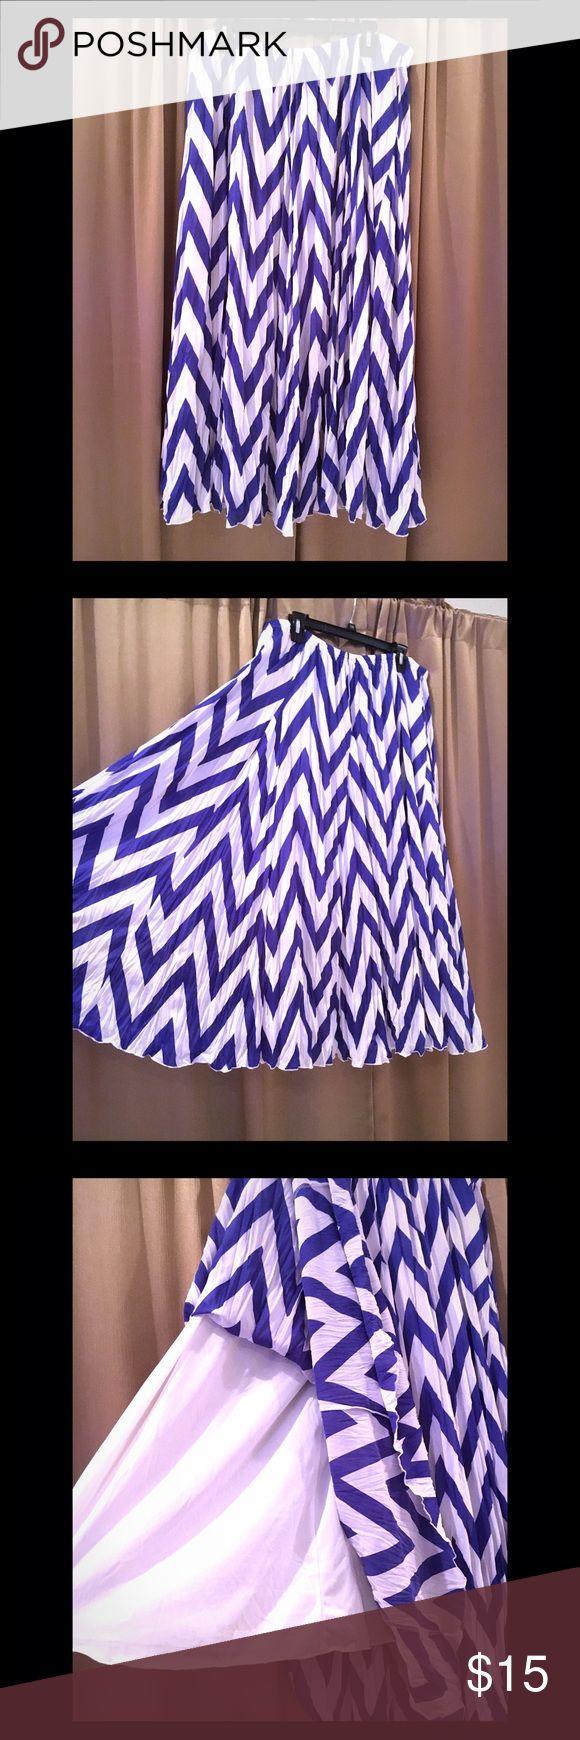 💙🔹Blue and White Chevron Maxi Skirt 🔷 Maxi Shirt. Comfortable. Chevron. Lined, not see through.  Elastic Waistband. XL Women's. Zac & Rachel Skirts Maxi